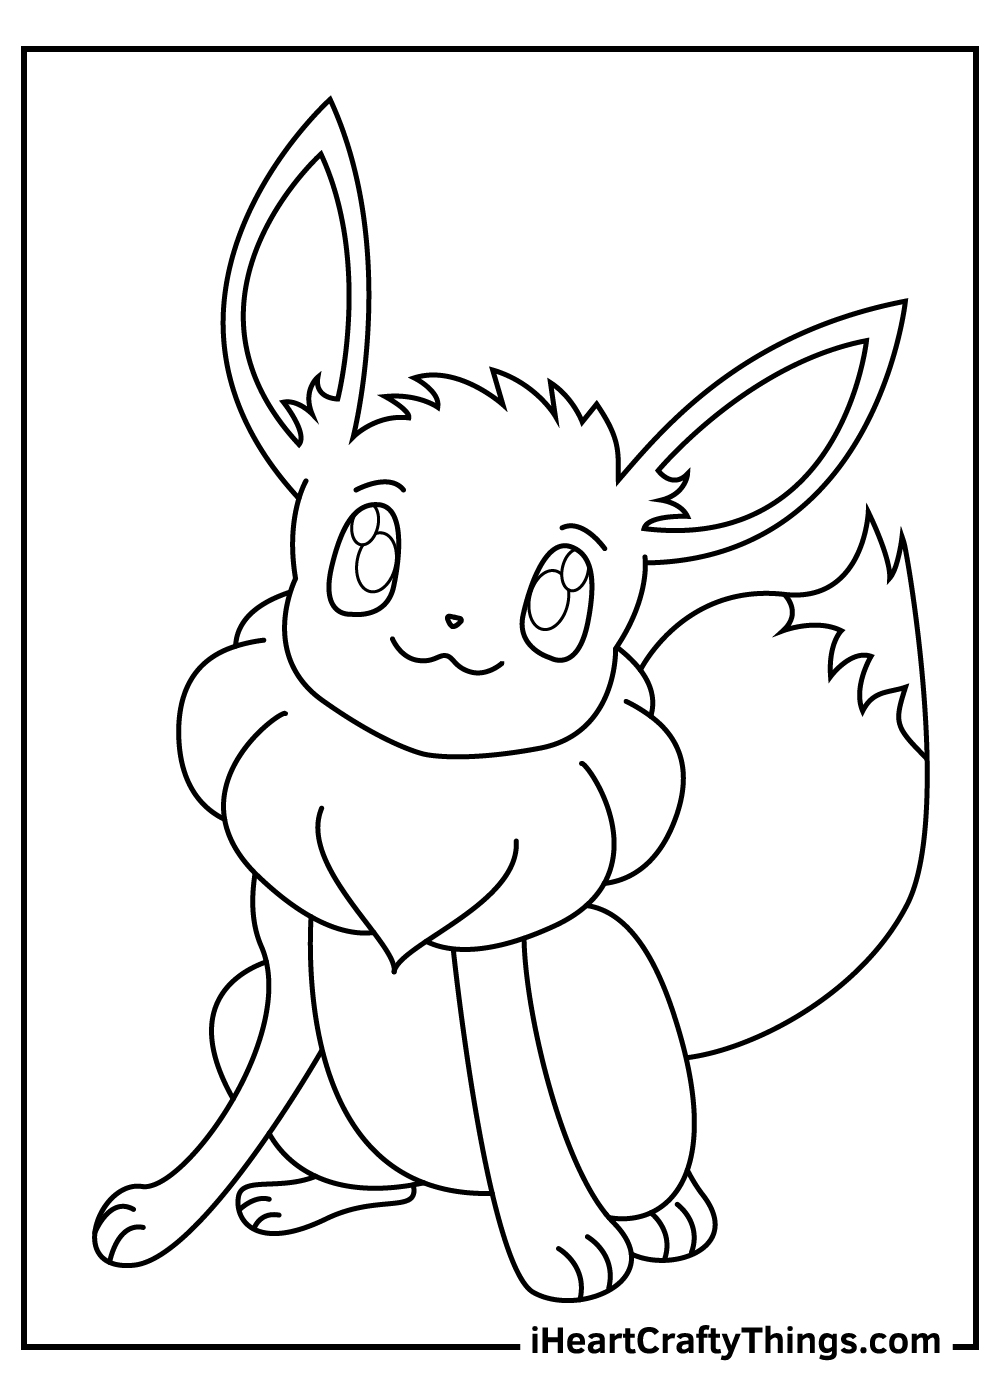 adorable eevee pokemon coloring sheets free pdf